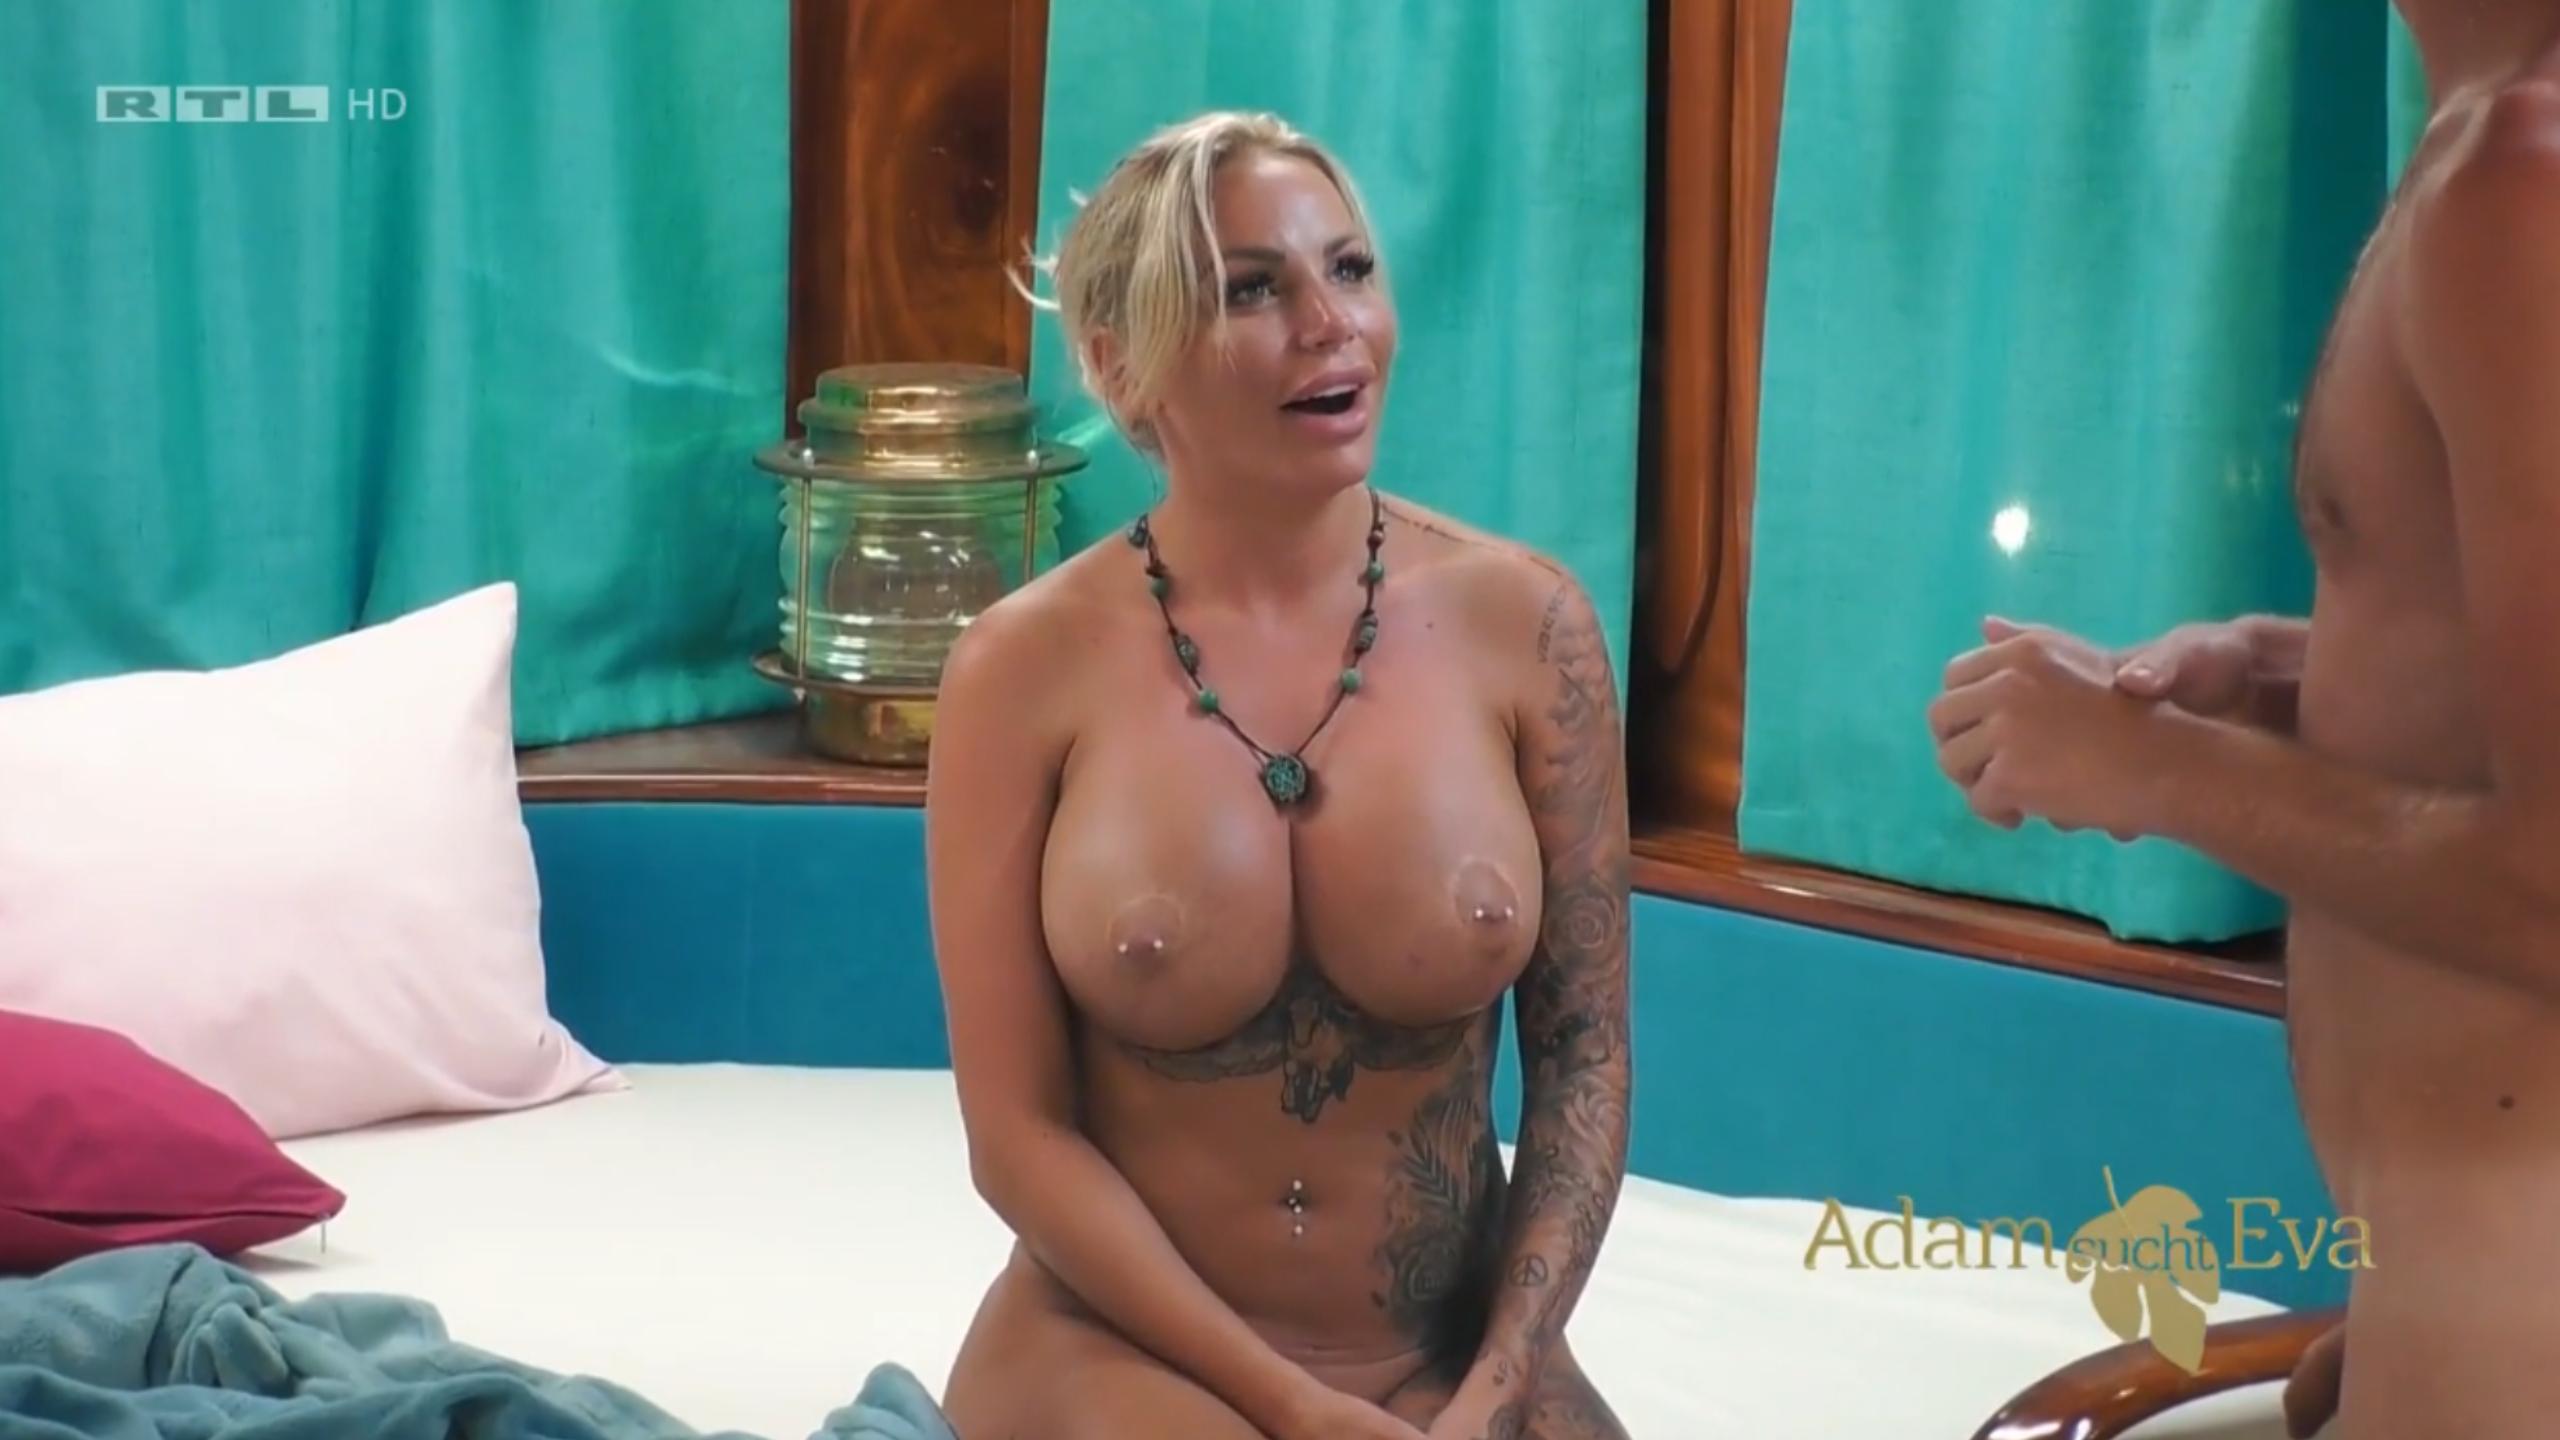 Nudes gina lisa Gina Kirschenheiter's